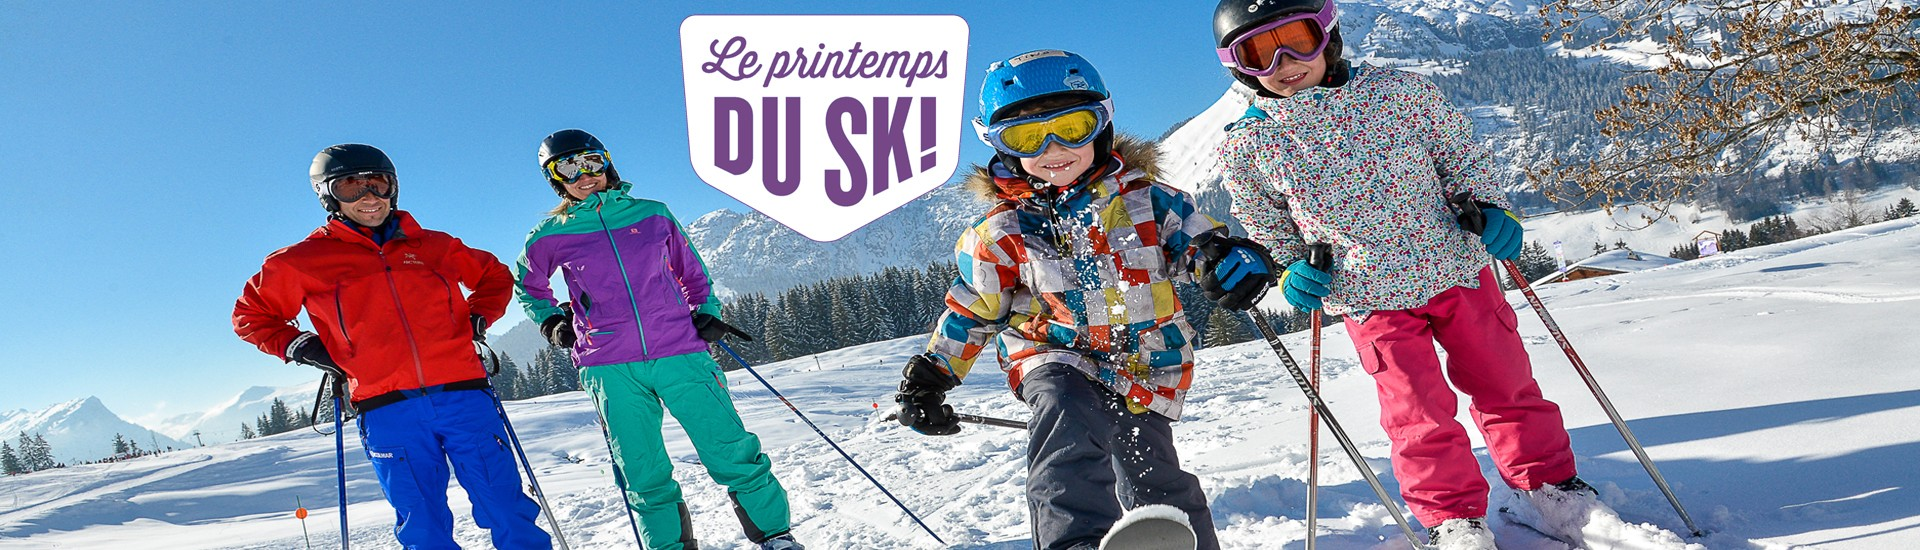 banniere-printemps-du-ski-fr-1466